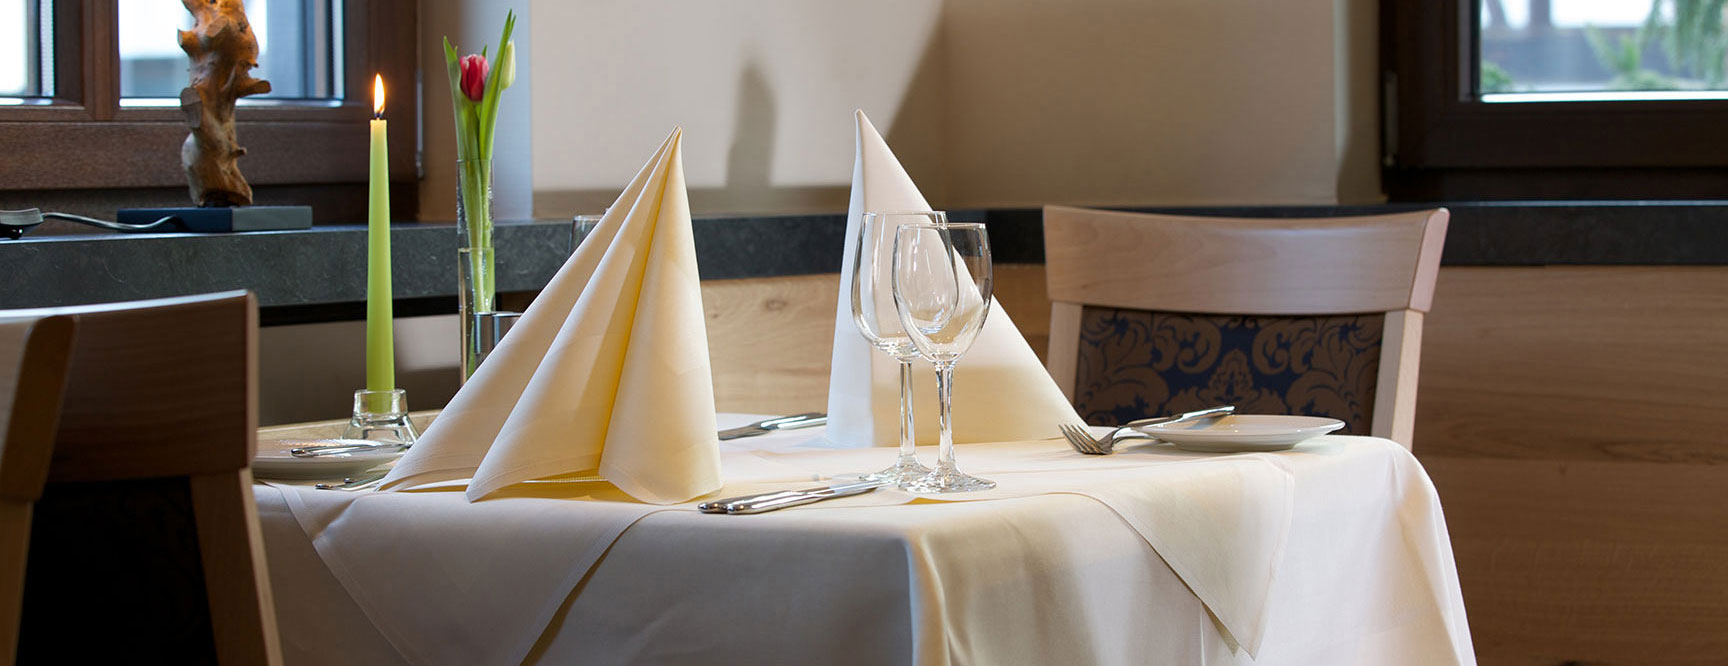 Roessle-Restaurant-1349x520